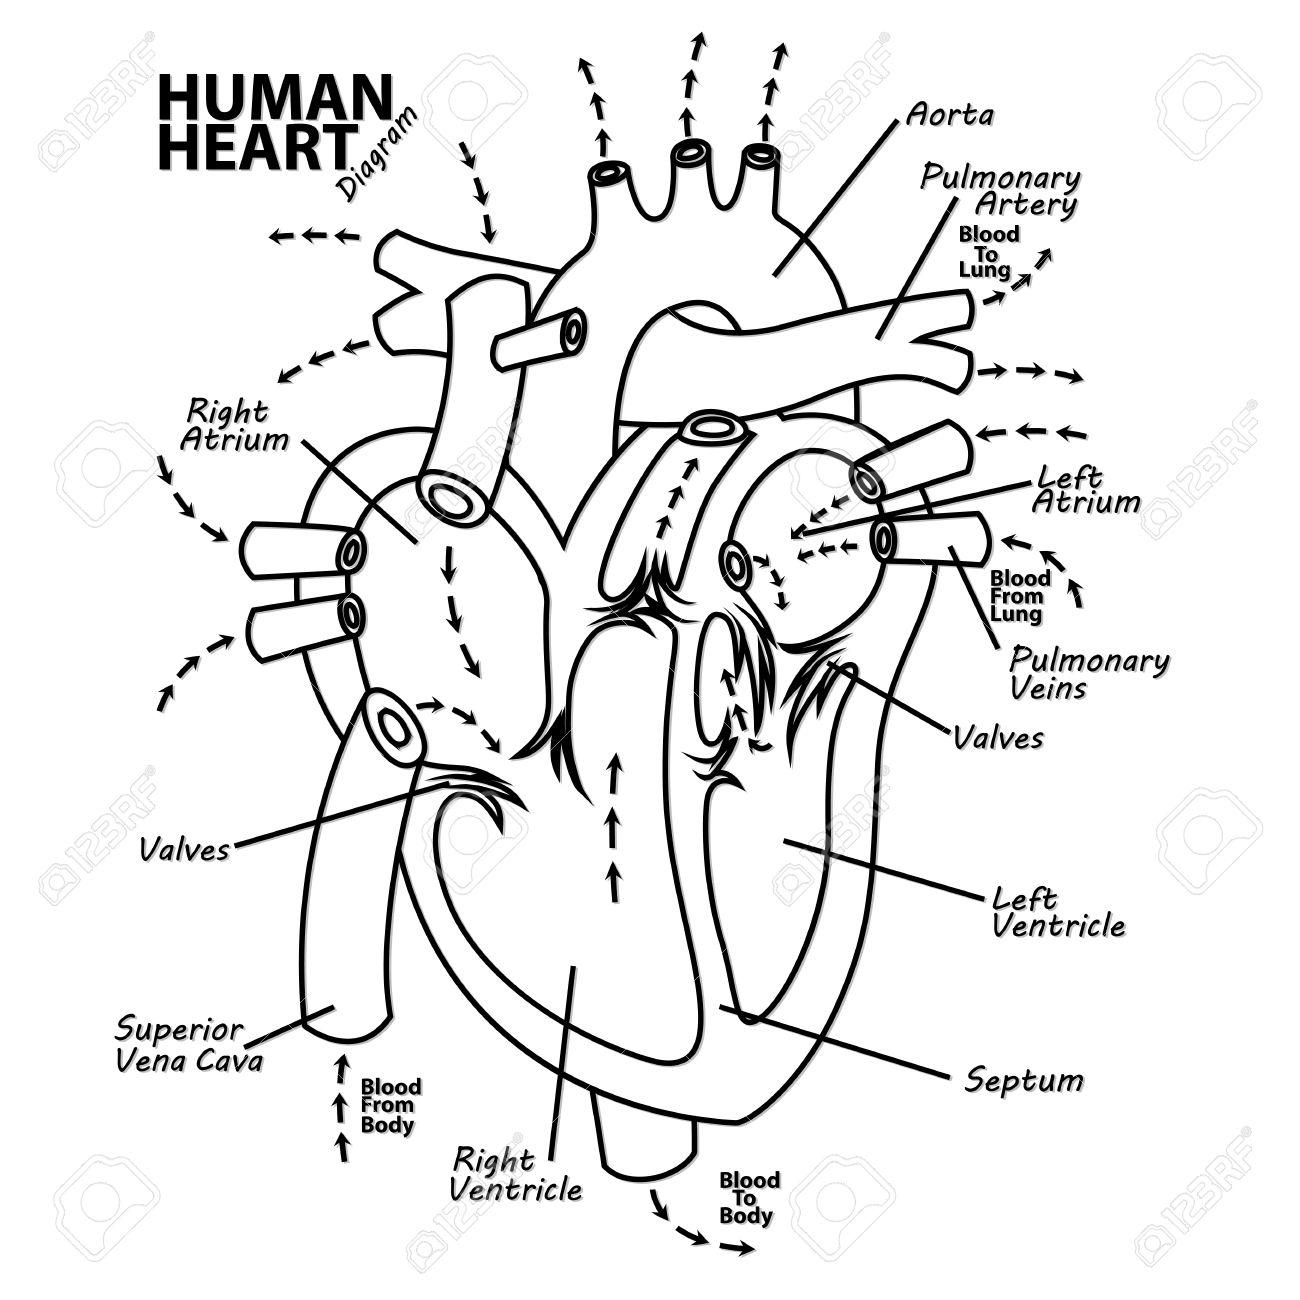 Human Heart Diagram Anatomy Tattoo Royalty Free Cliparts, Vectors ...